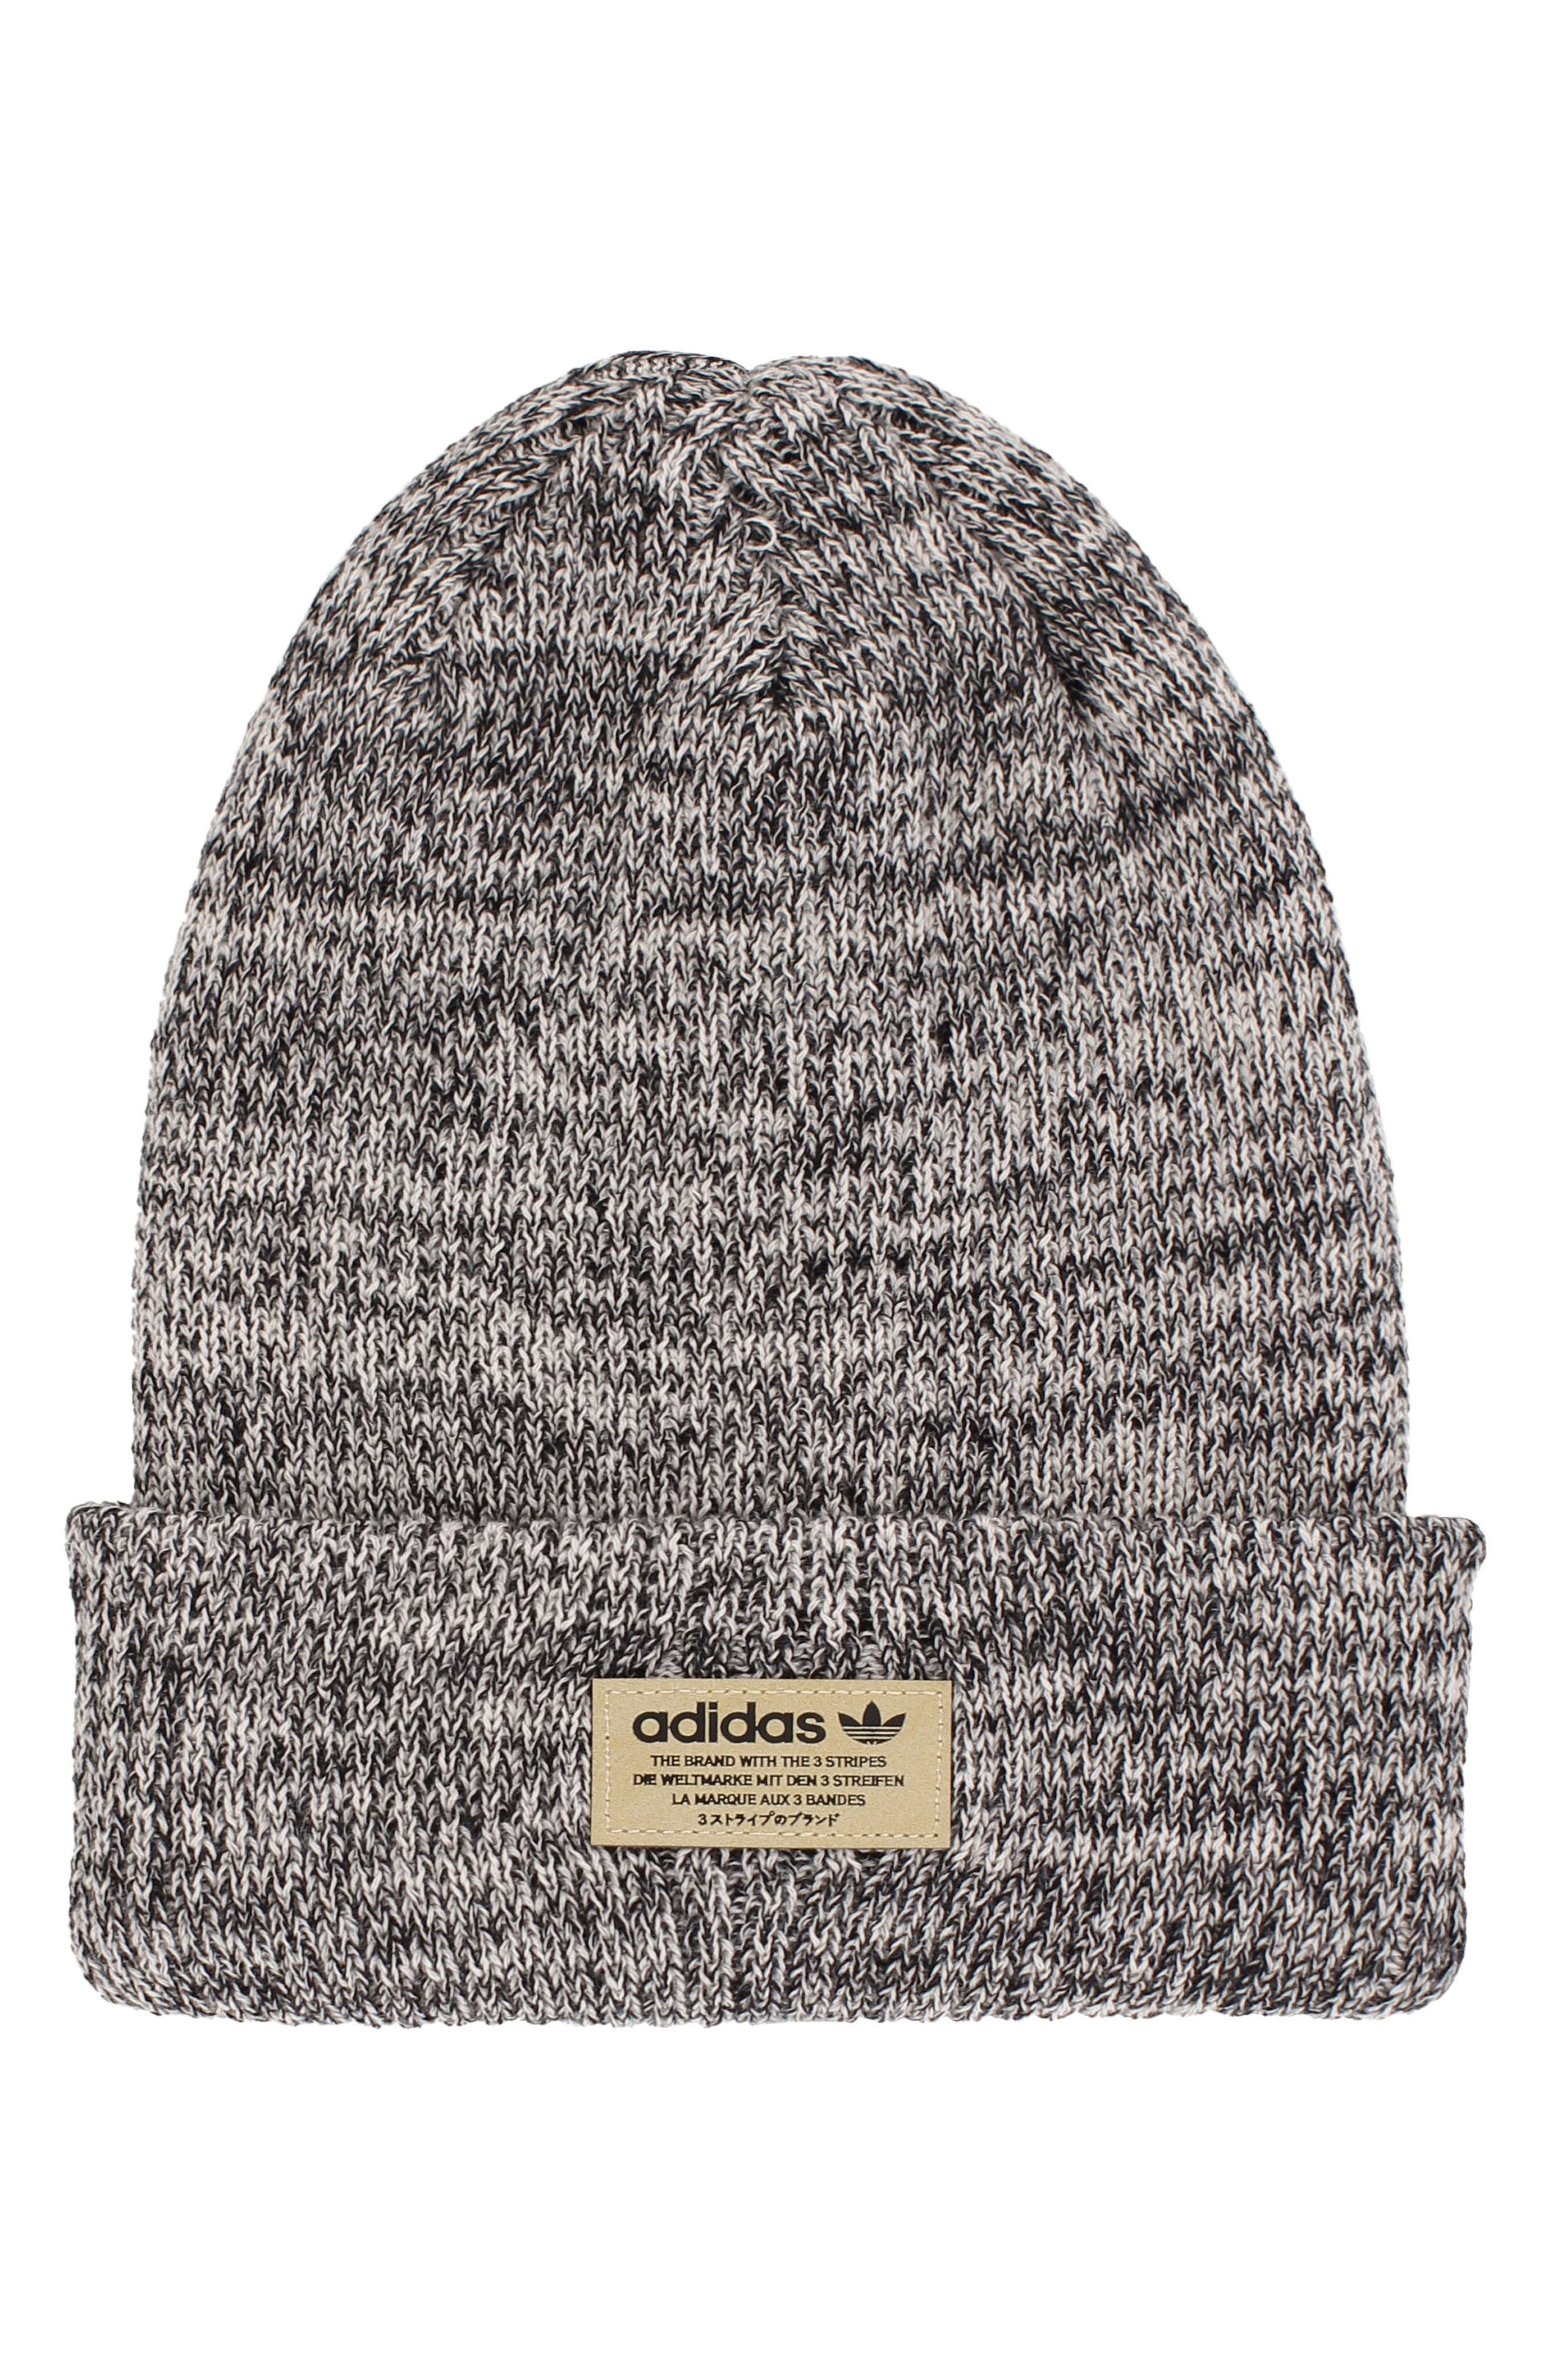 adidas Originals NMD Knit Cap